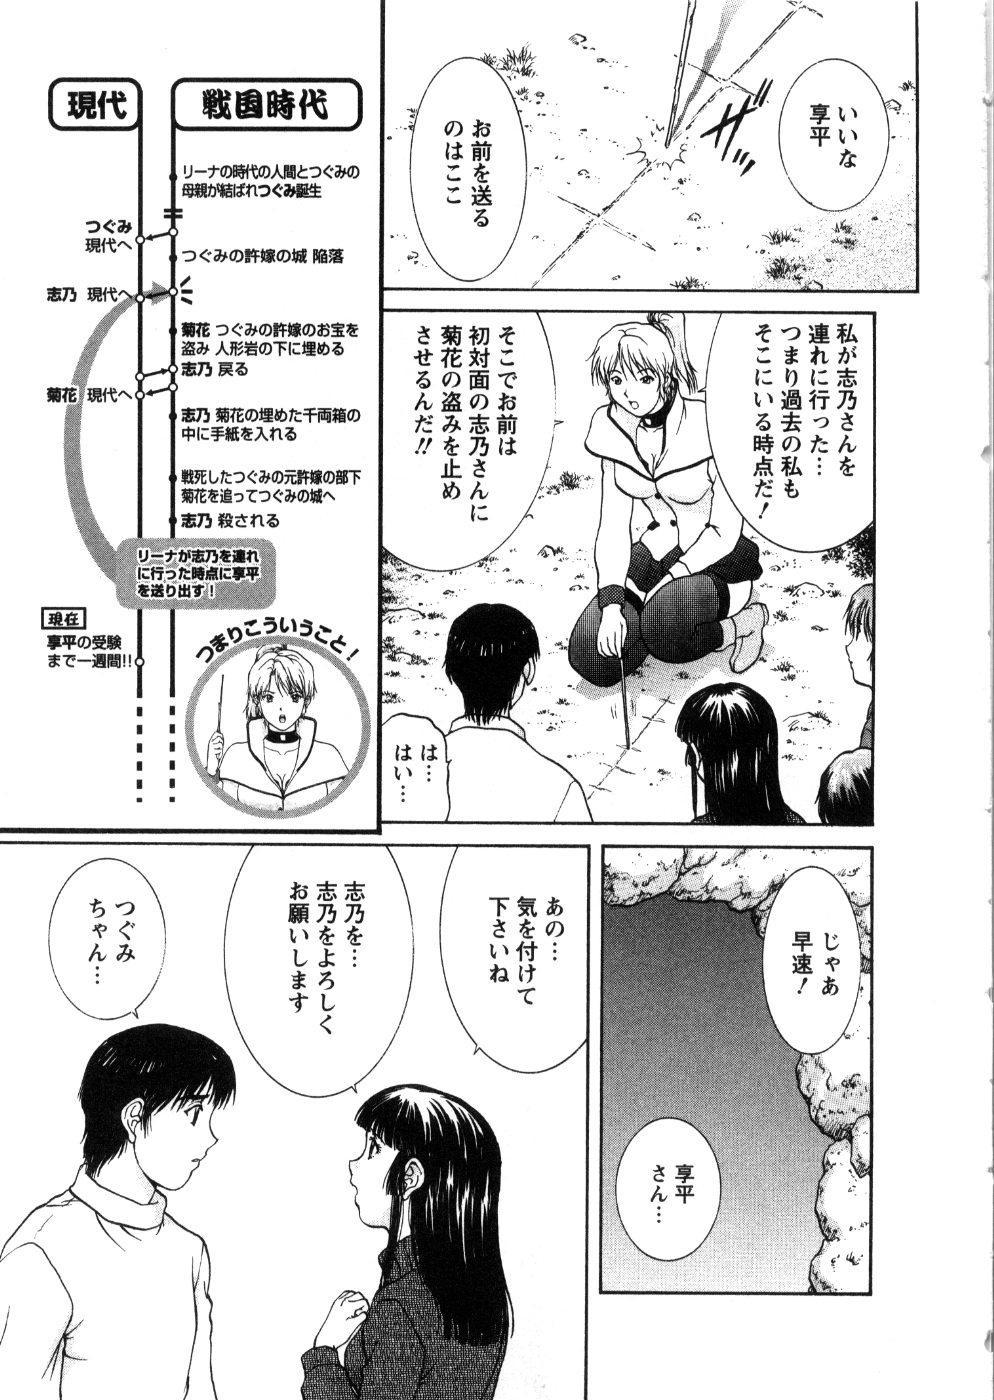 Oneechan-tachi ga Yatte Kuru 03 20